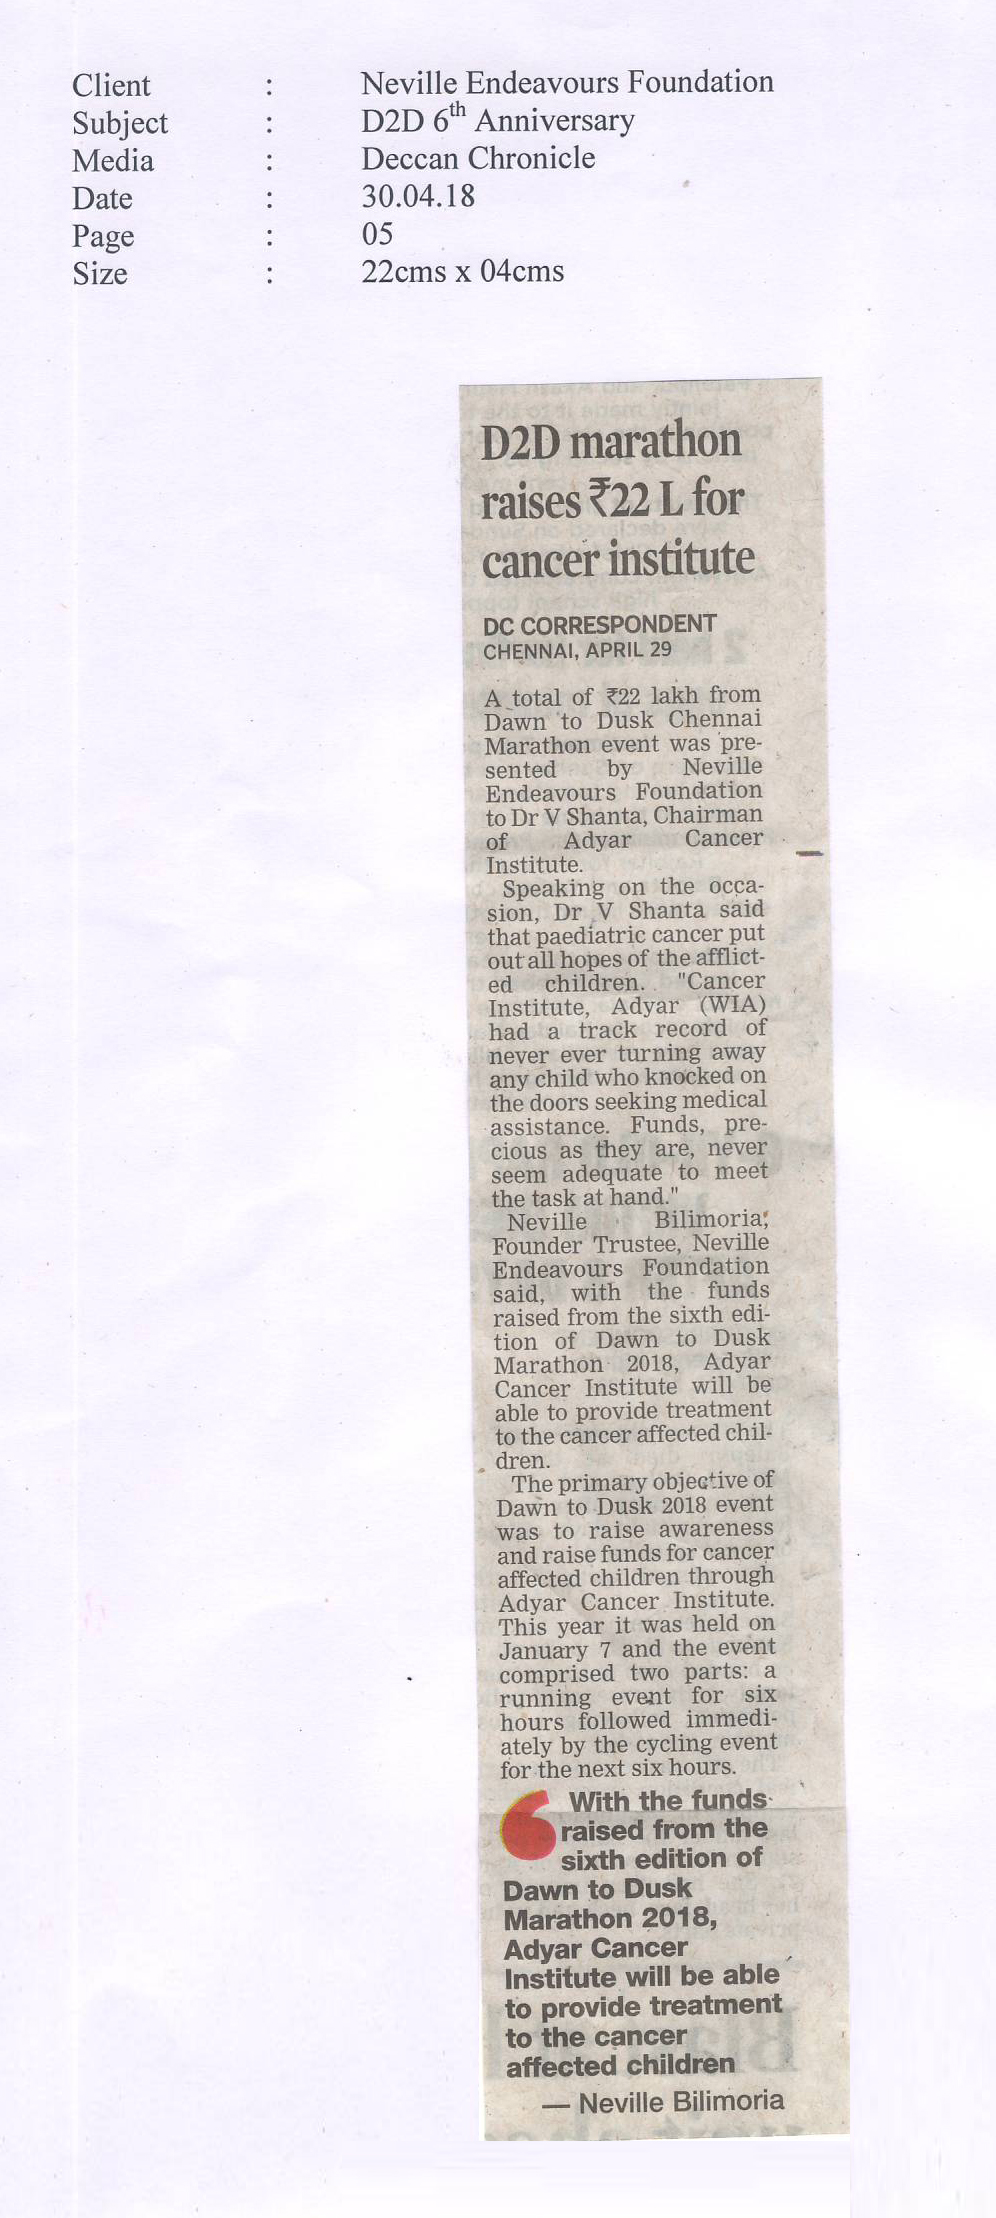 Dawn  To Dusk 2018 –  Deccan Chronicle – 30.04.18